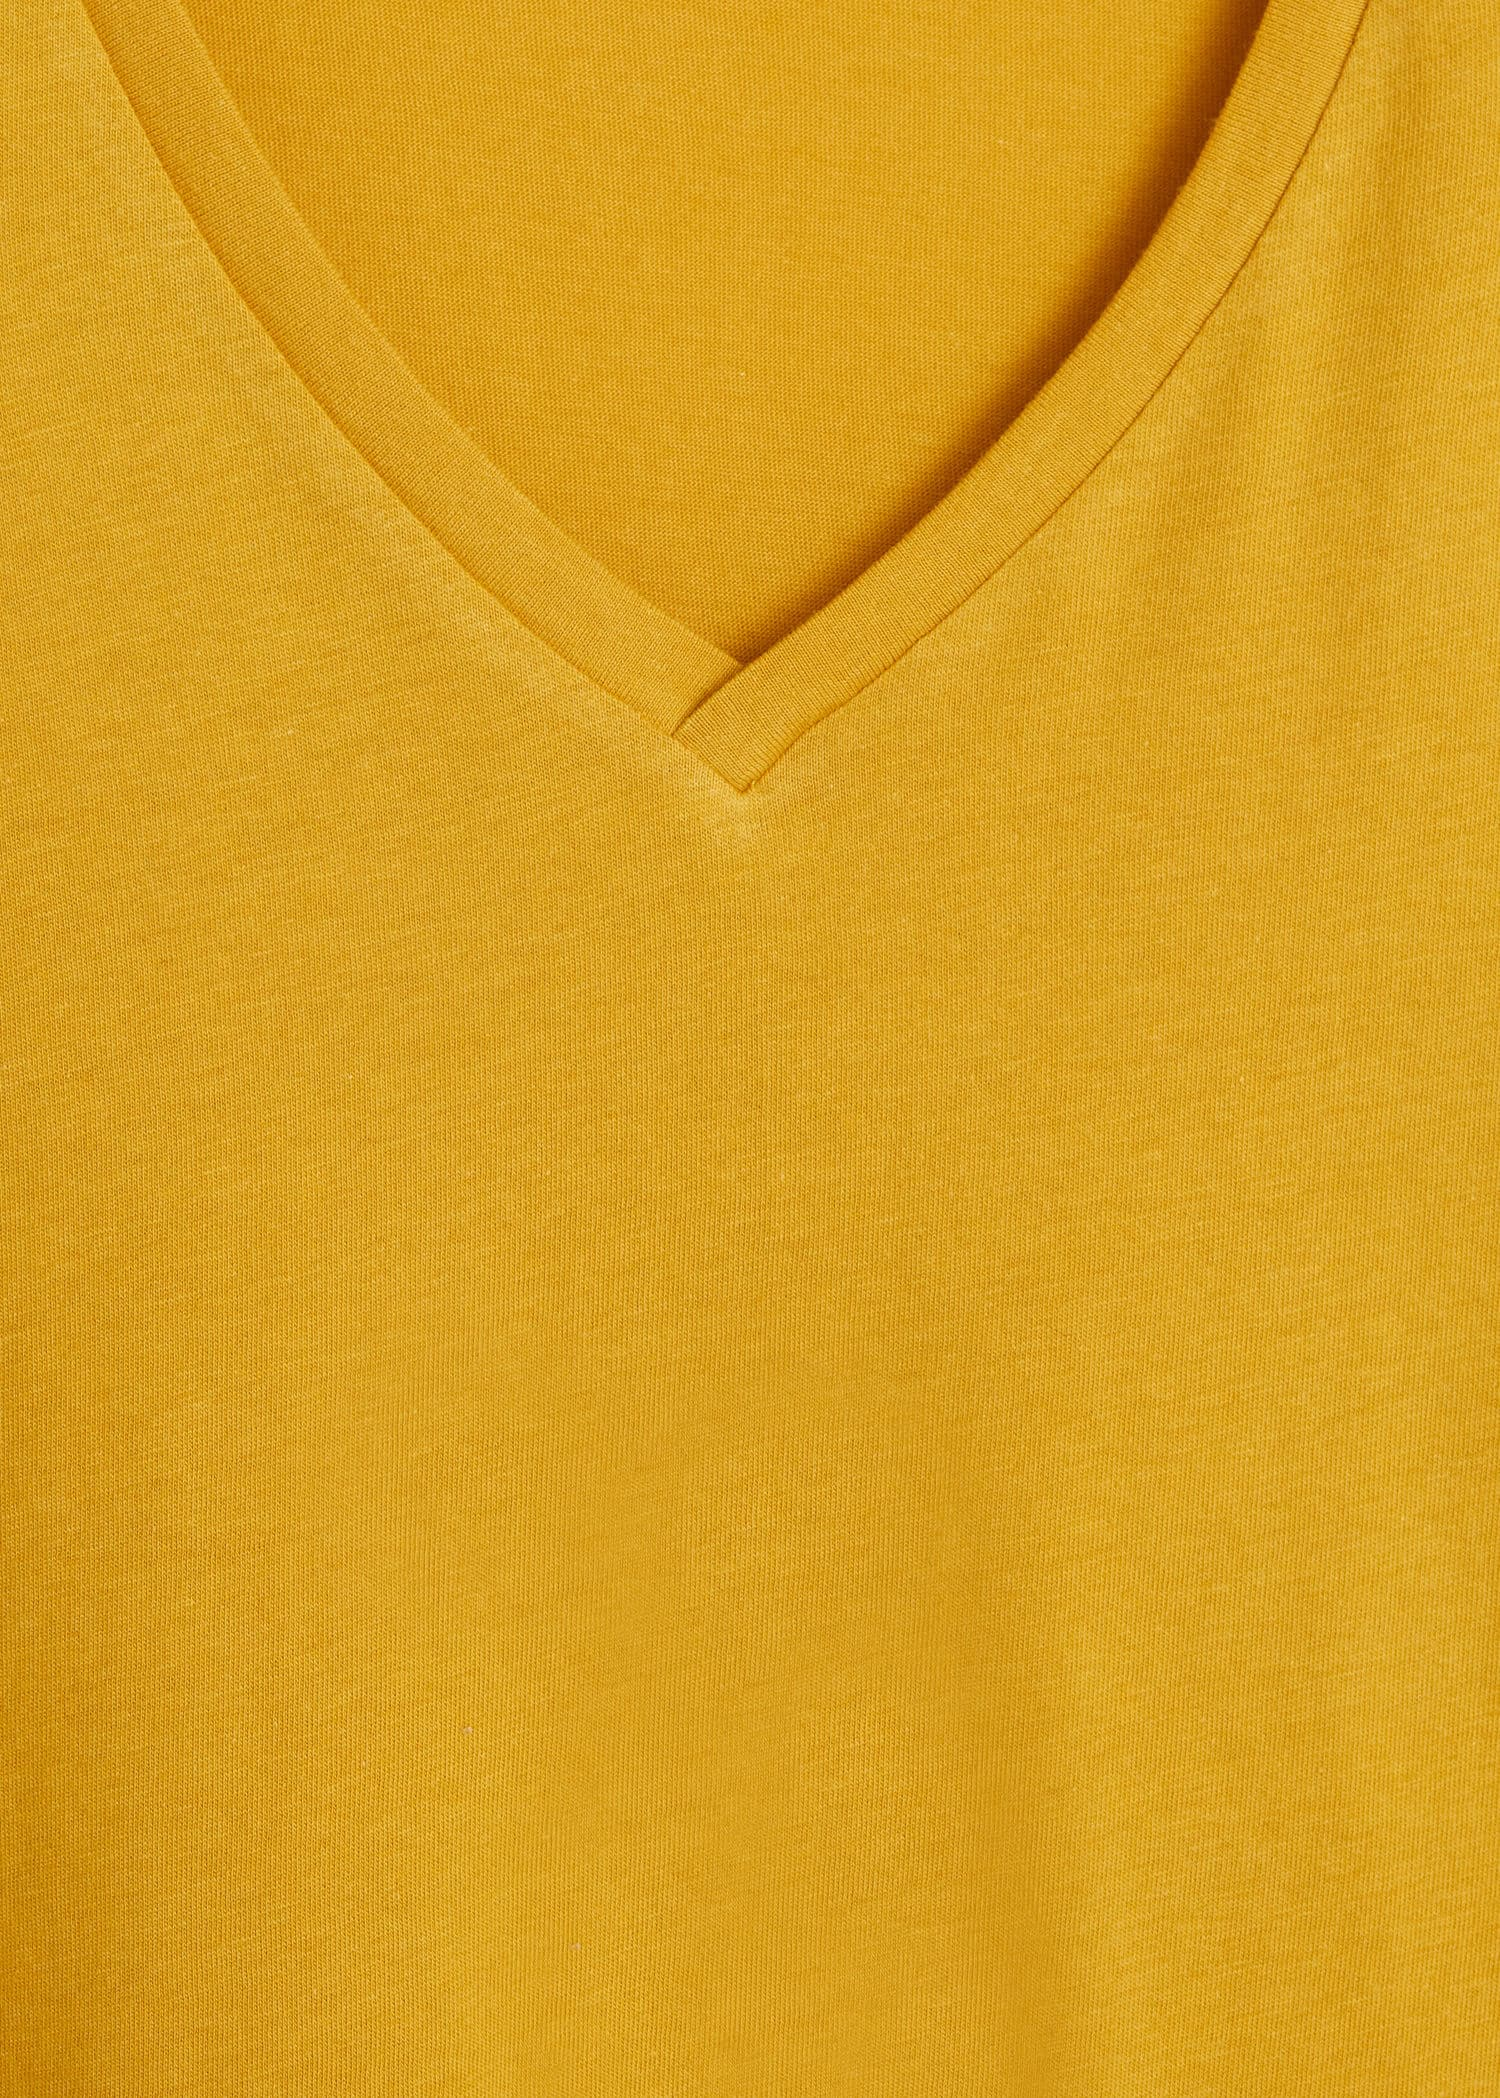 Polo para hombre Clásico Top Manga Corta Camisa Camiseta Lisa 100/% algodón